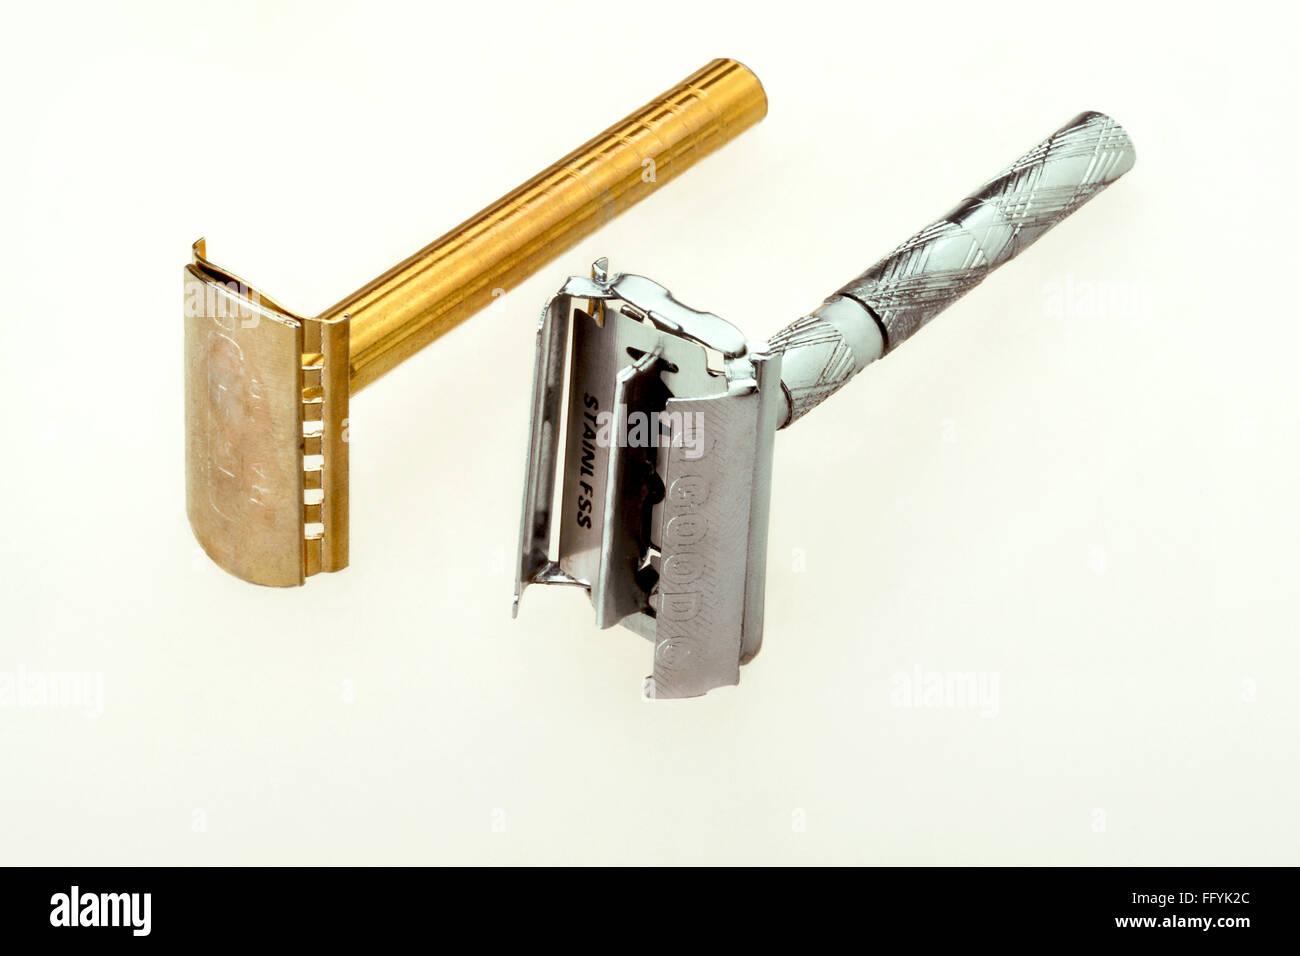 Shaving Blade Metallic Razors India - Stock Image